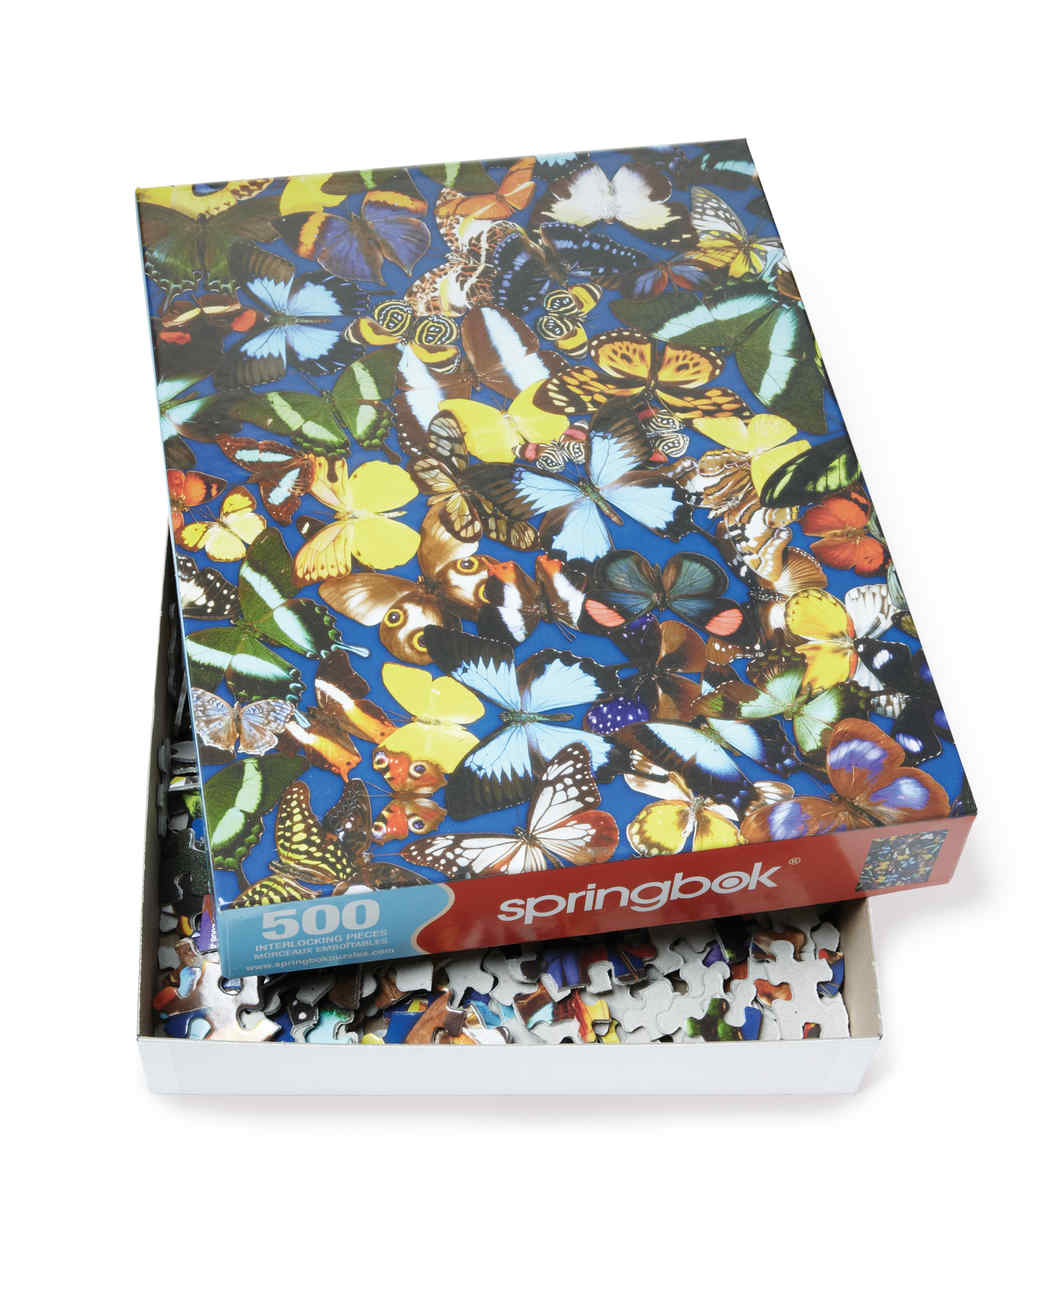 games-puzzle-0811mld107420.jpg